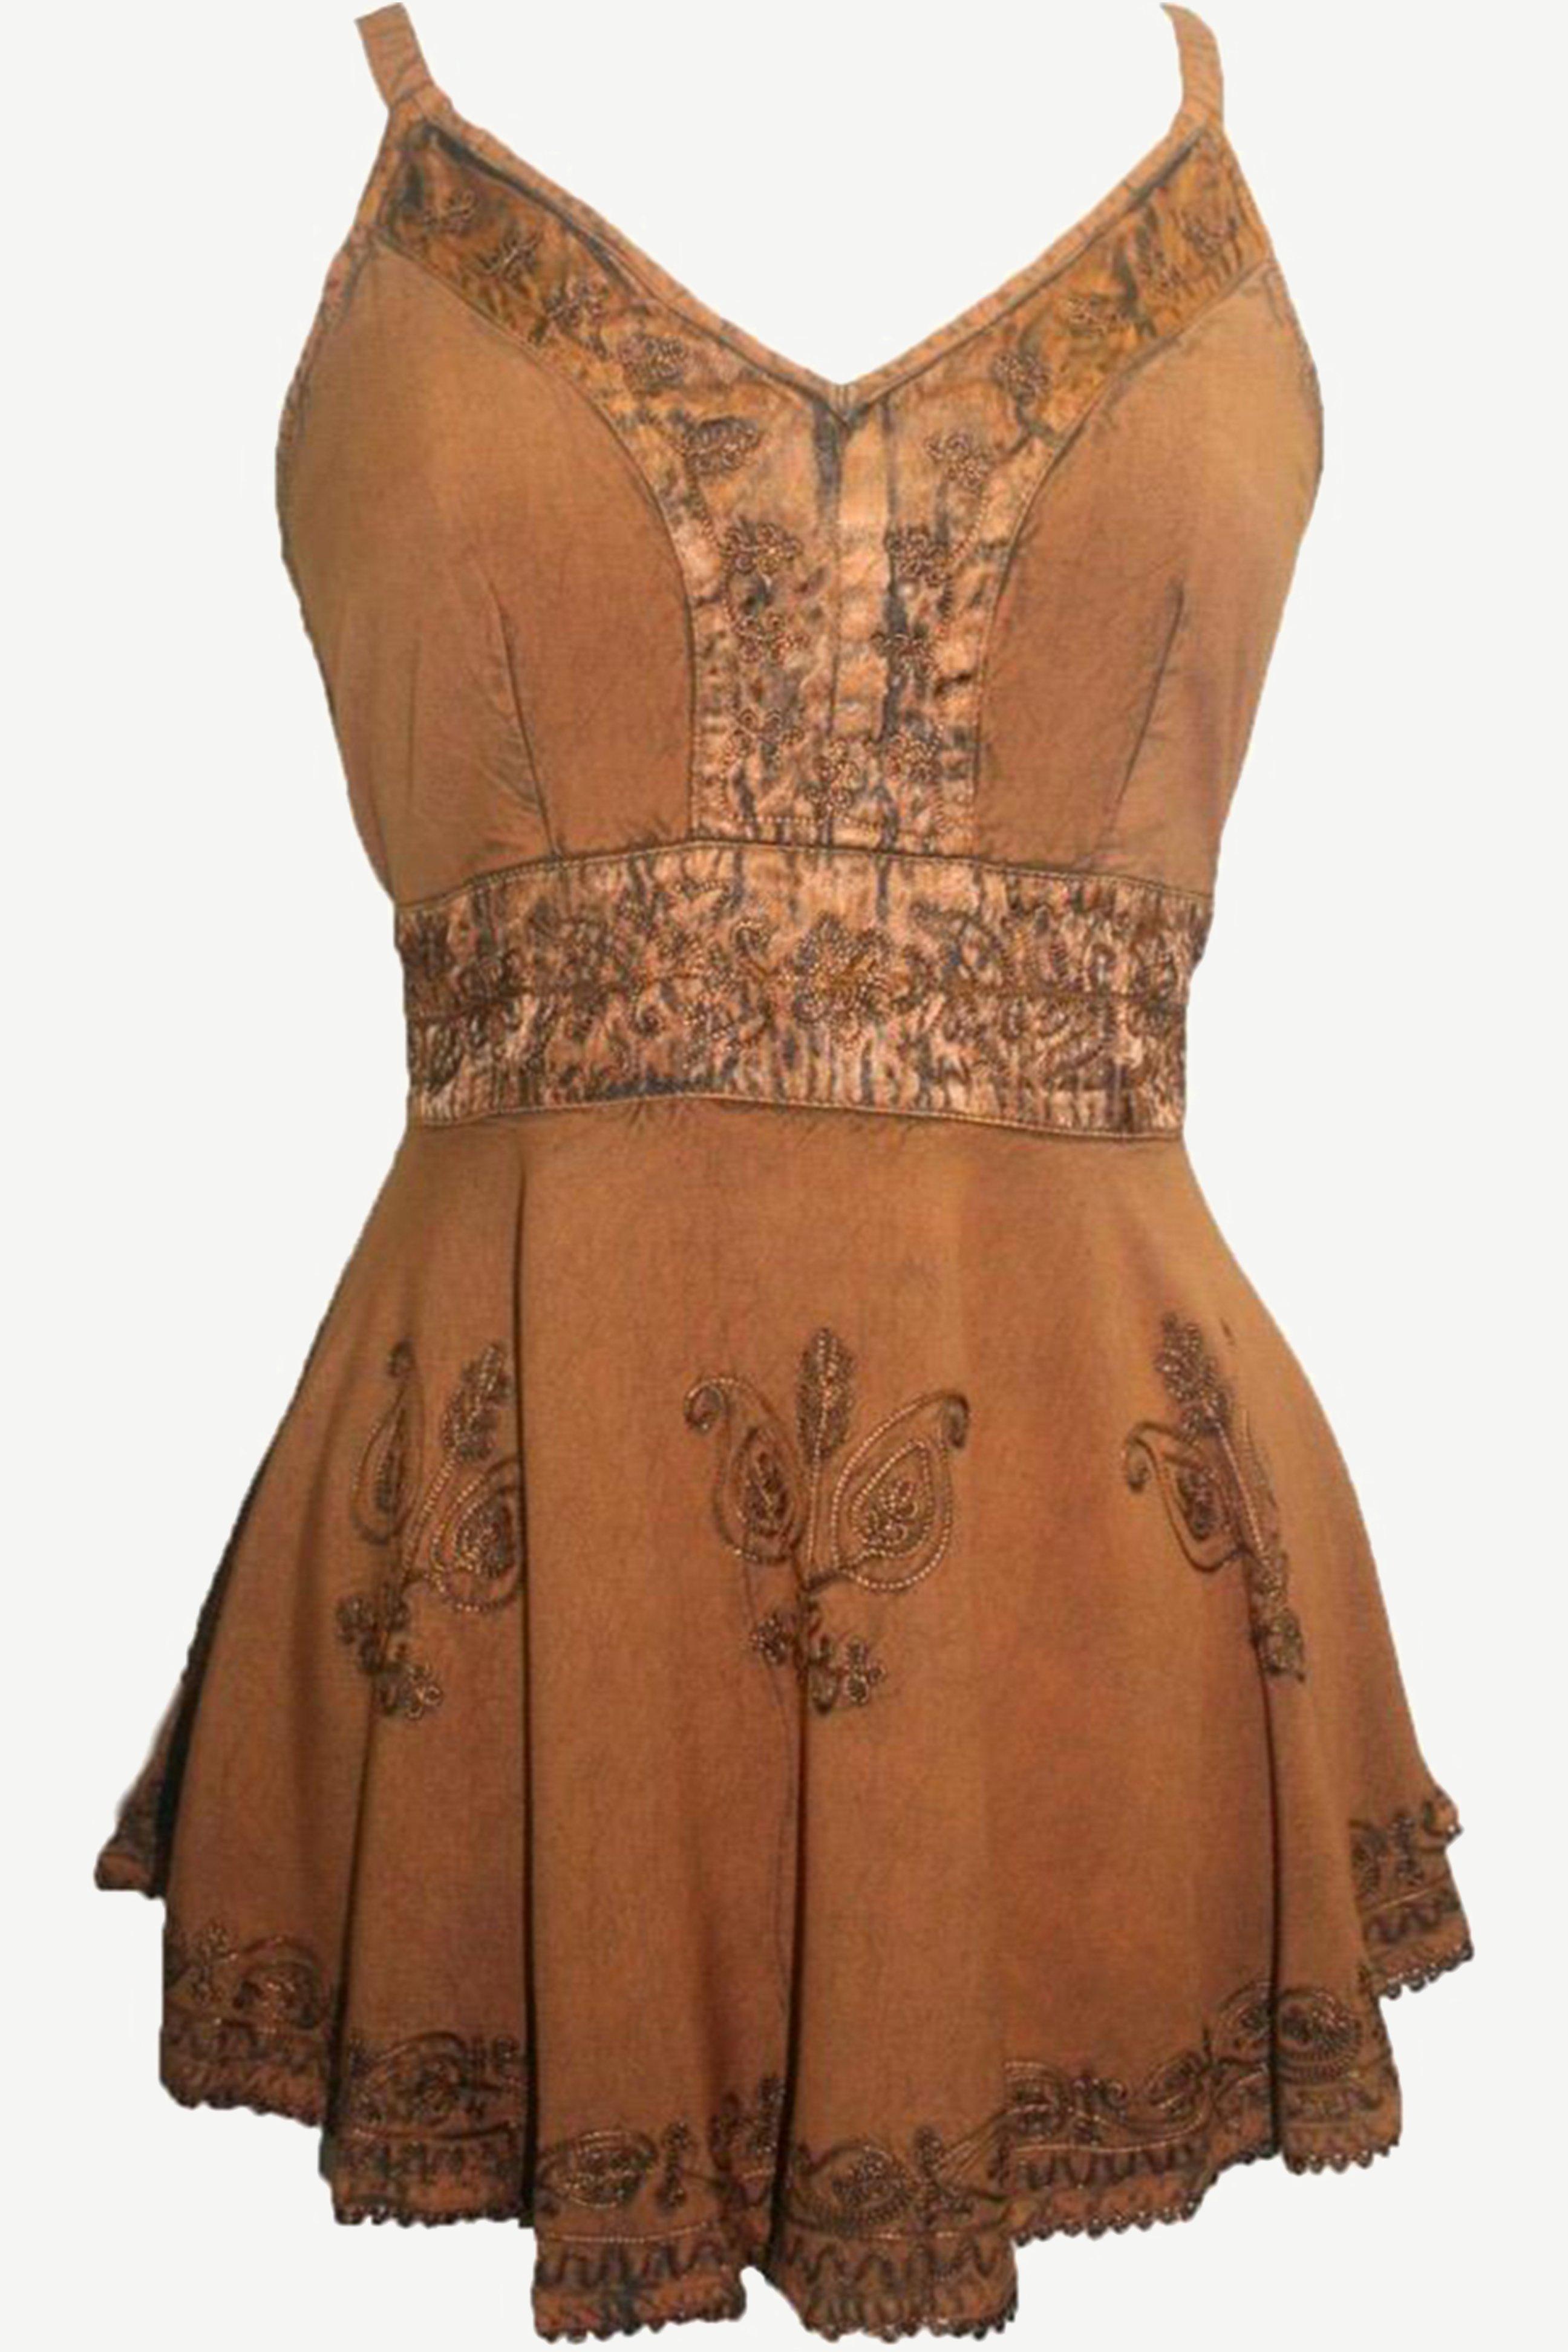 121 B Spaghetti Strap Medieval Gypsy Embroidered Tank Top #gypsy